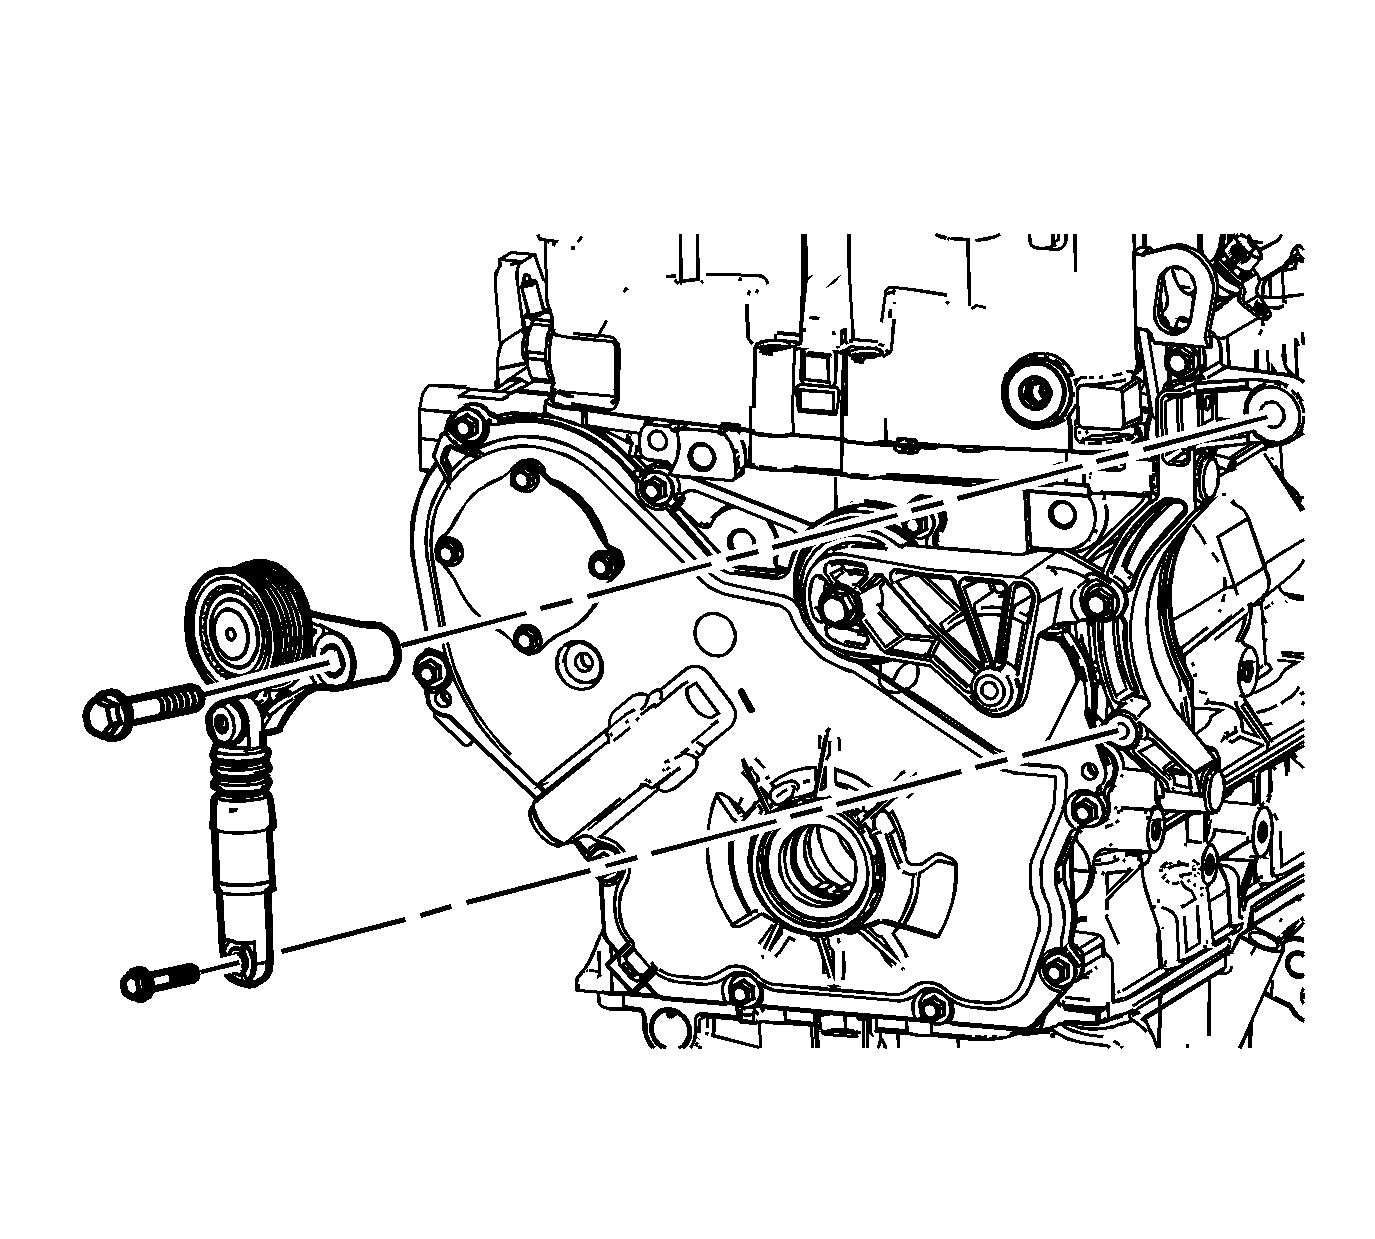 Fiat Doblo Wiring Diagrams